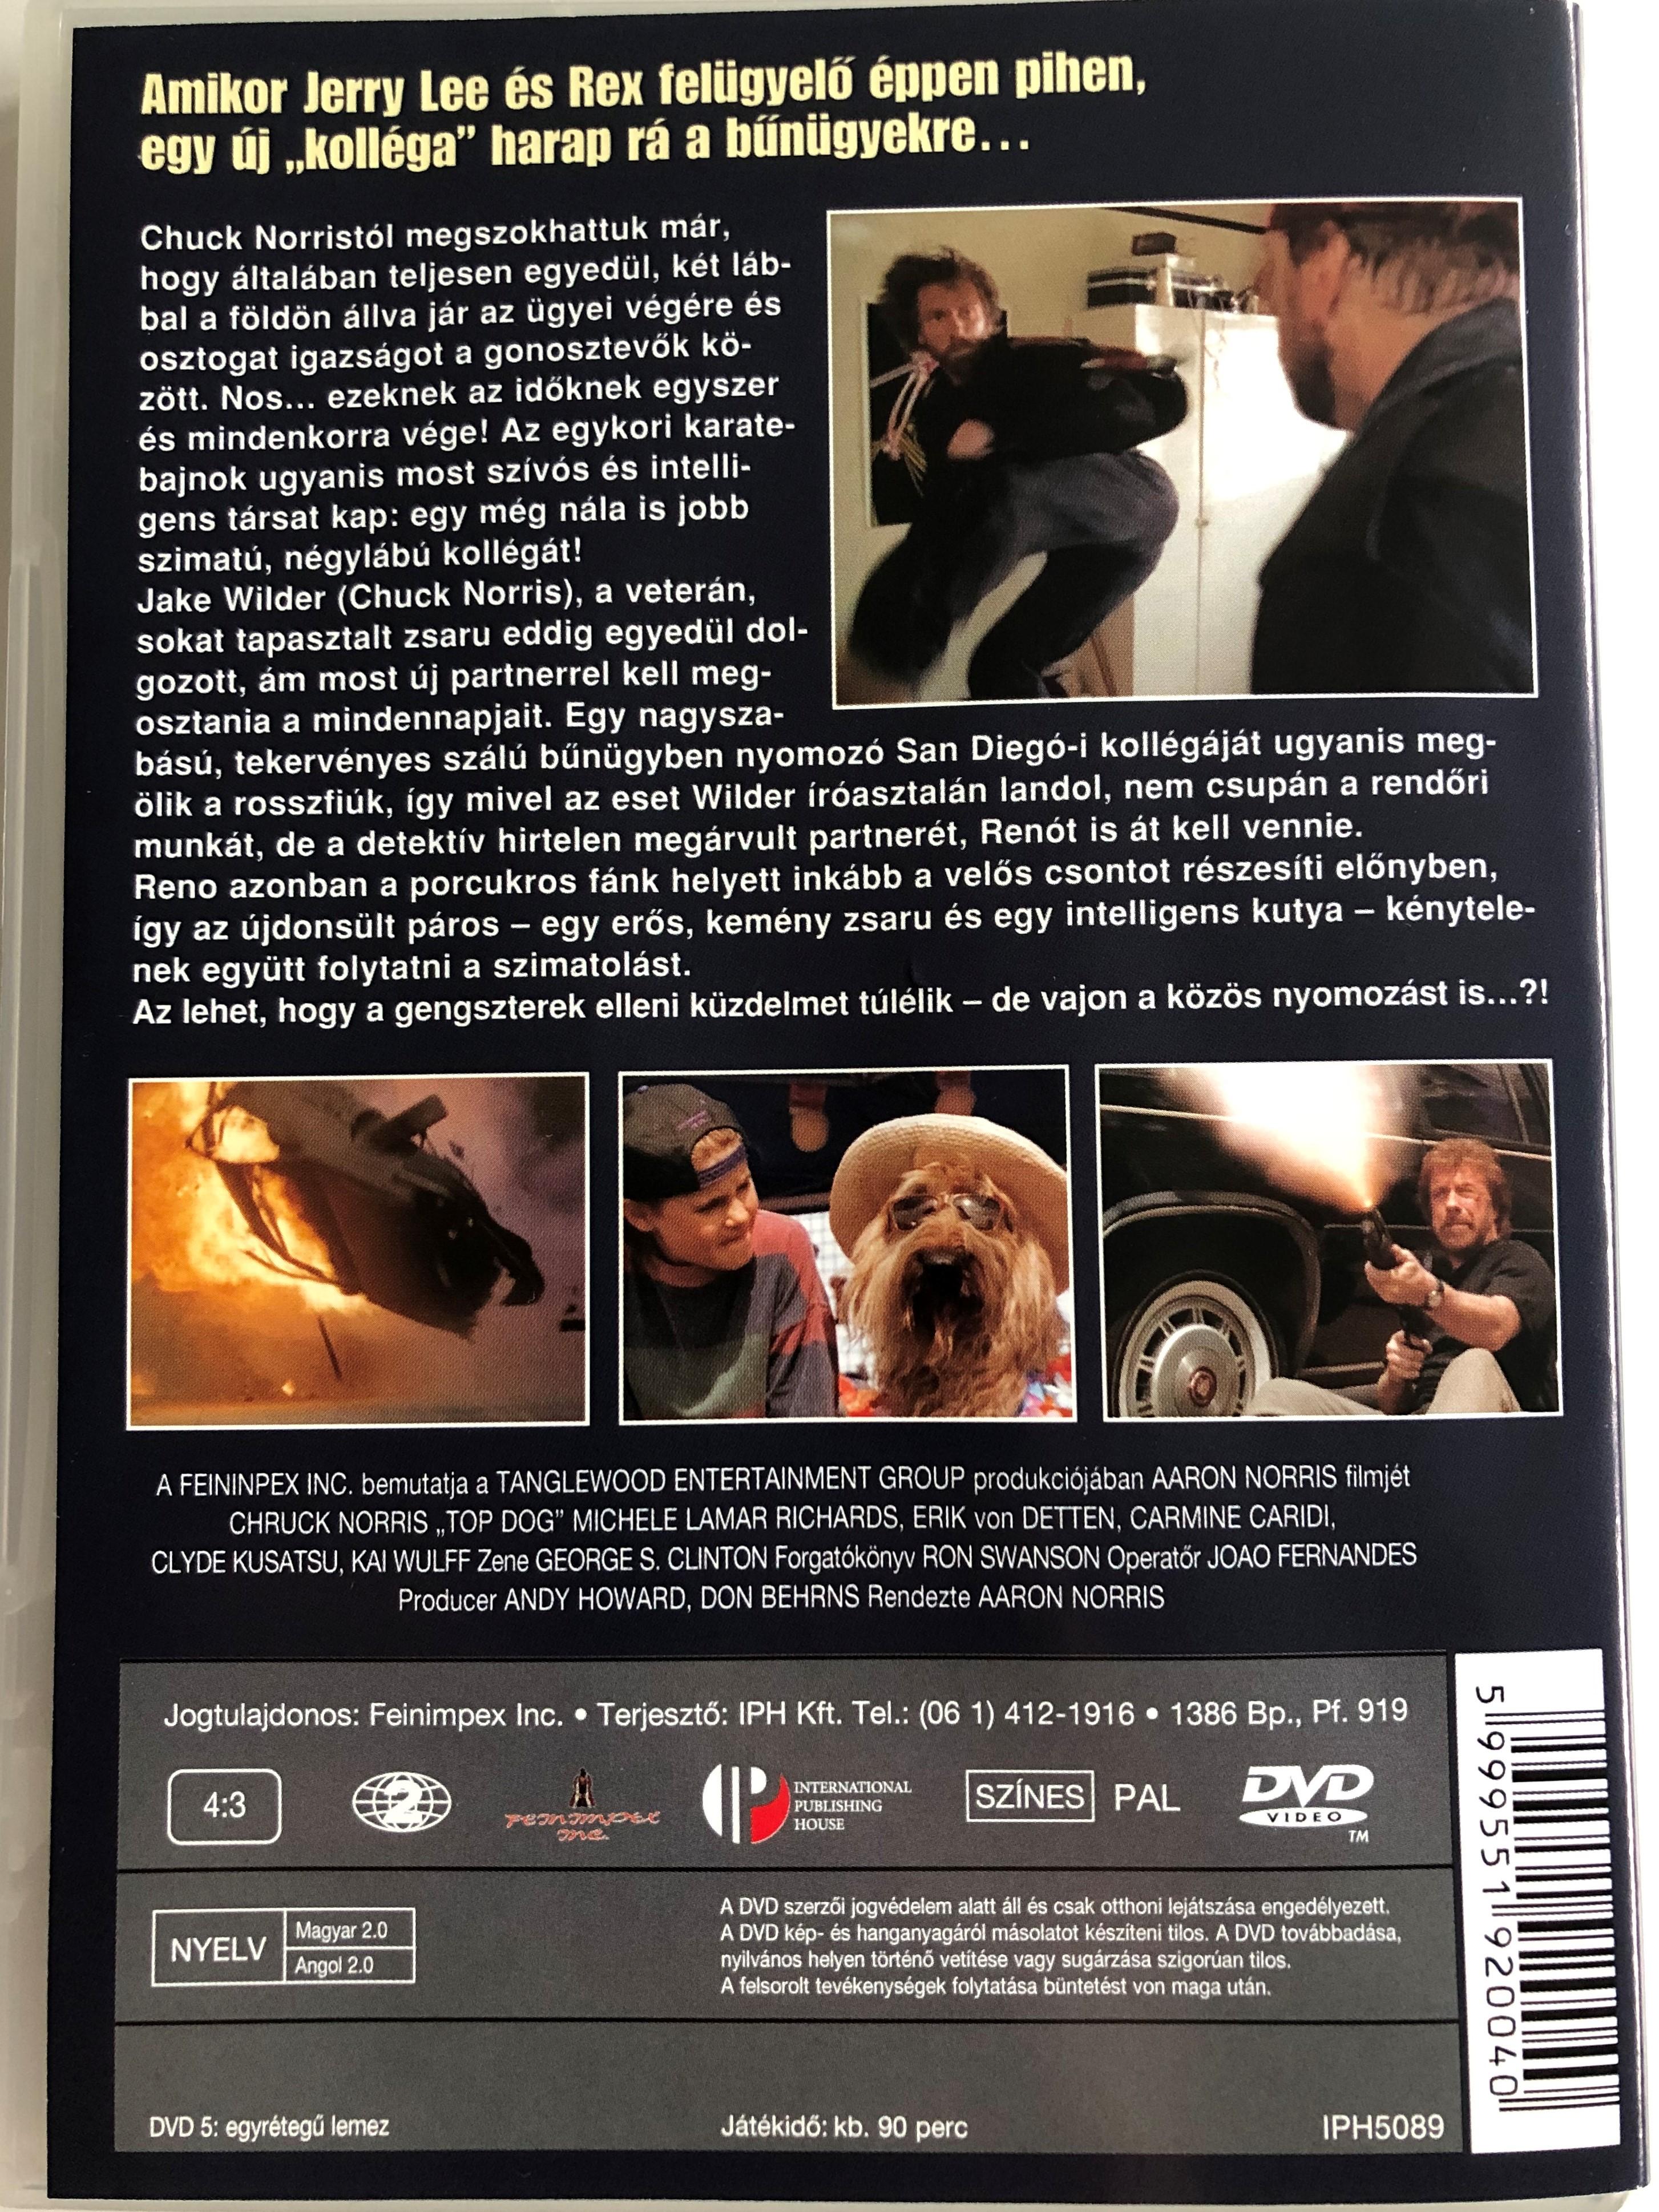 top-dog-dvd-1995-szuperhekus-kutyab-rben-2.jpg